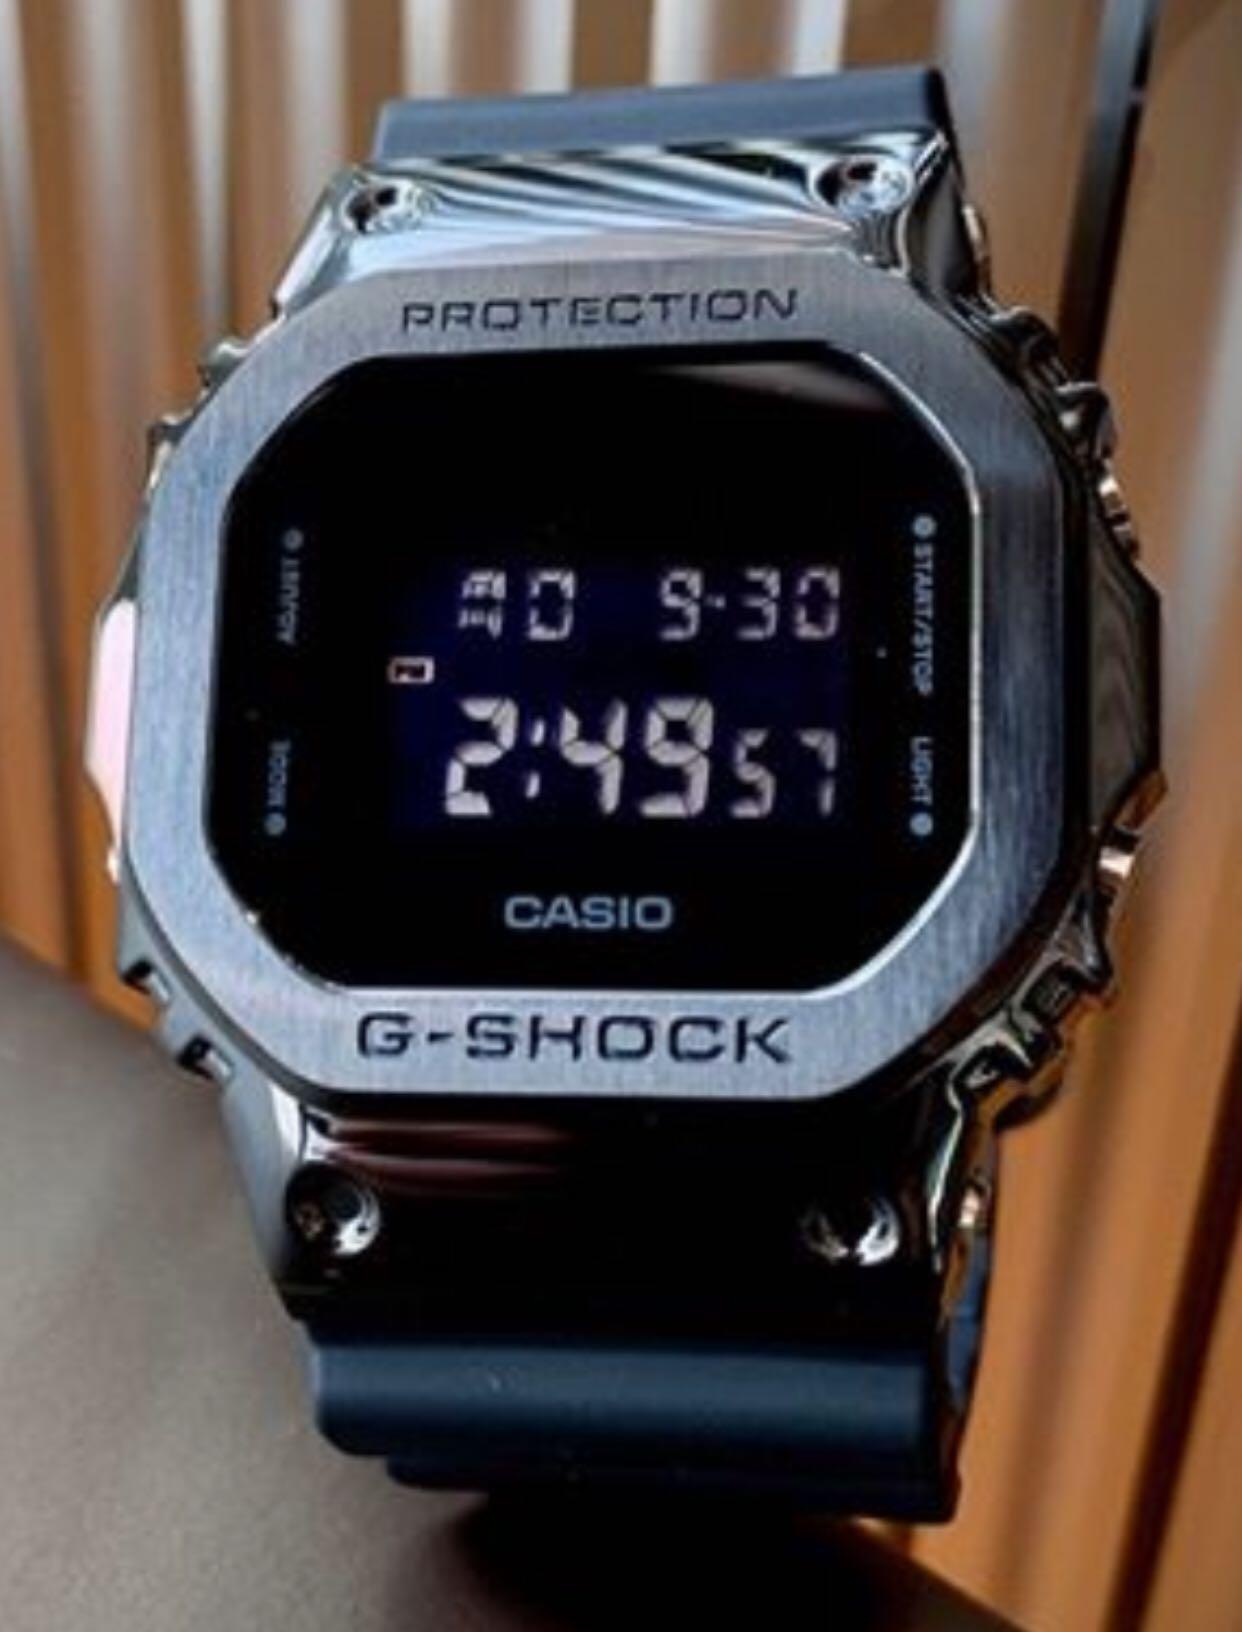 NEW🌟EDITION : GSHOCK UNISEX DIVER SPORTS WATCH : 100% ORIGINAL AUTHENTIC CASIO G-SHOCK : GM-5000B-1DR / GM-5000B-1 / GM5000B-1 / DW-5600-1